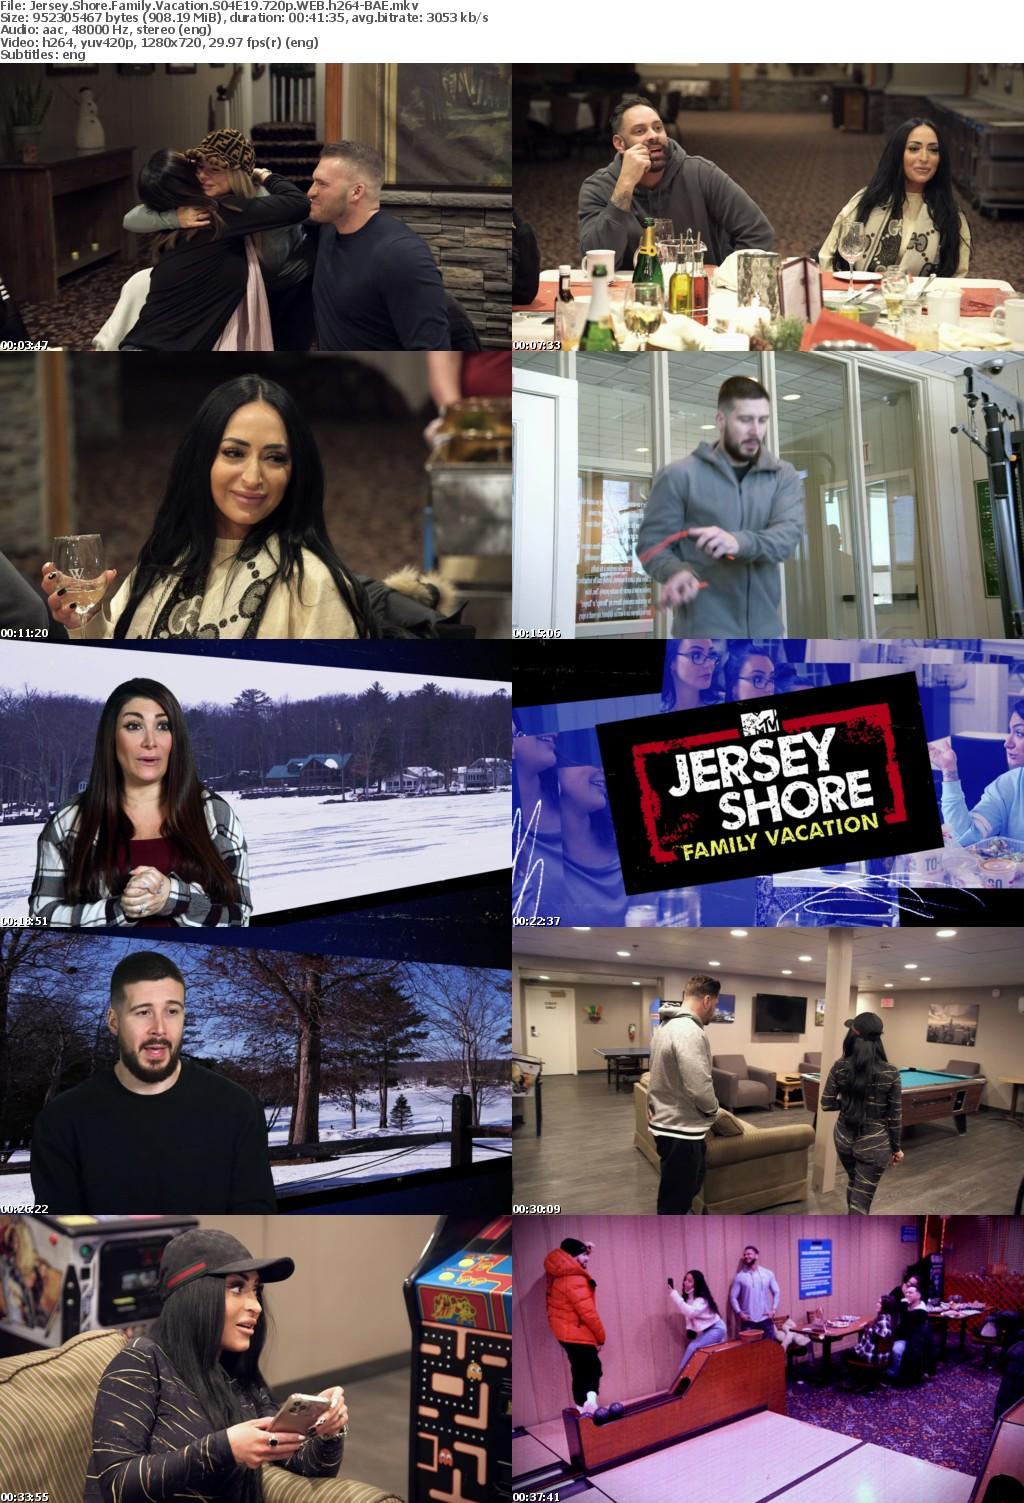 Jersey Shore Family Vacation S04E19 720p WEB h264-BAE